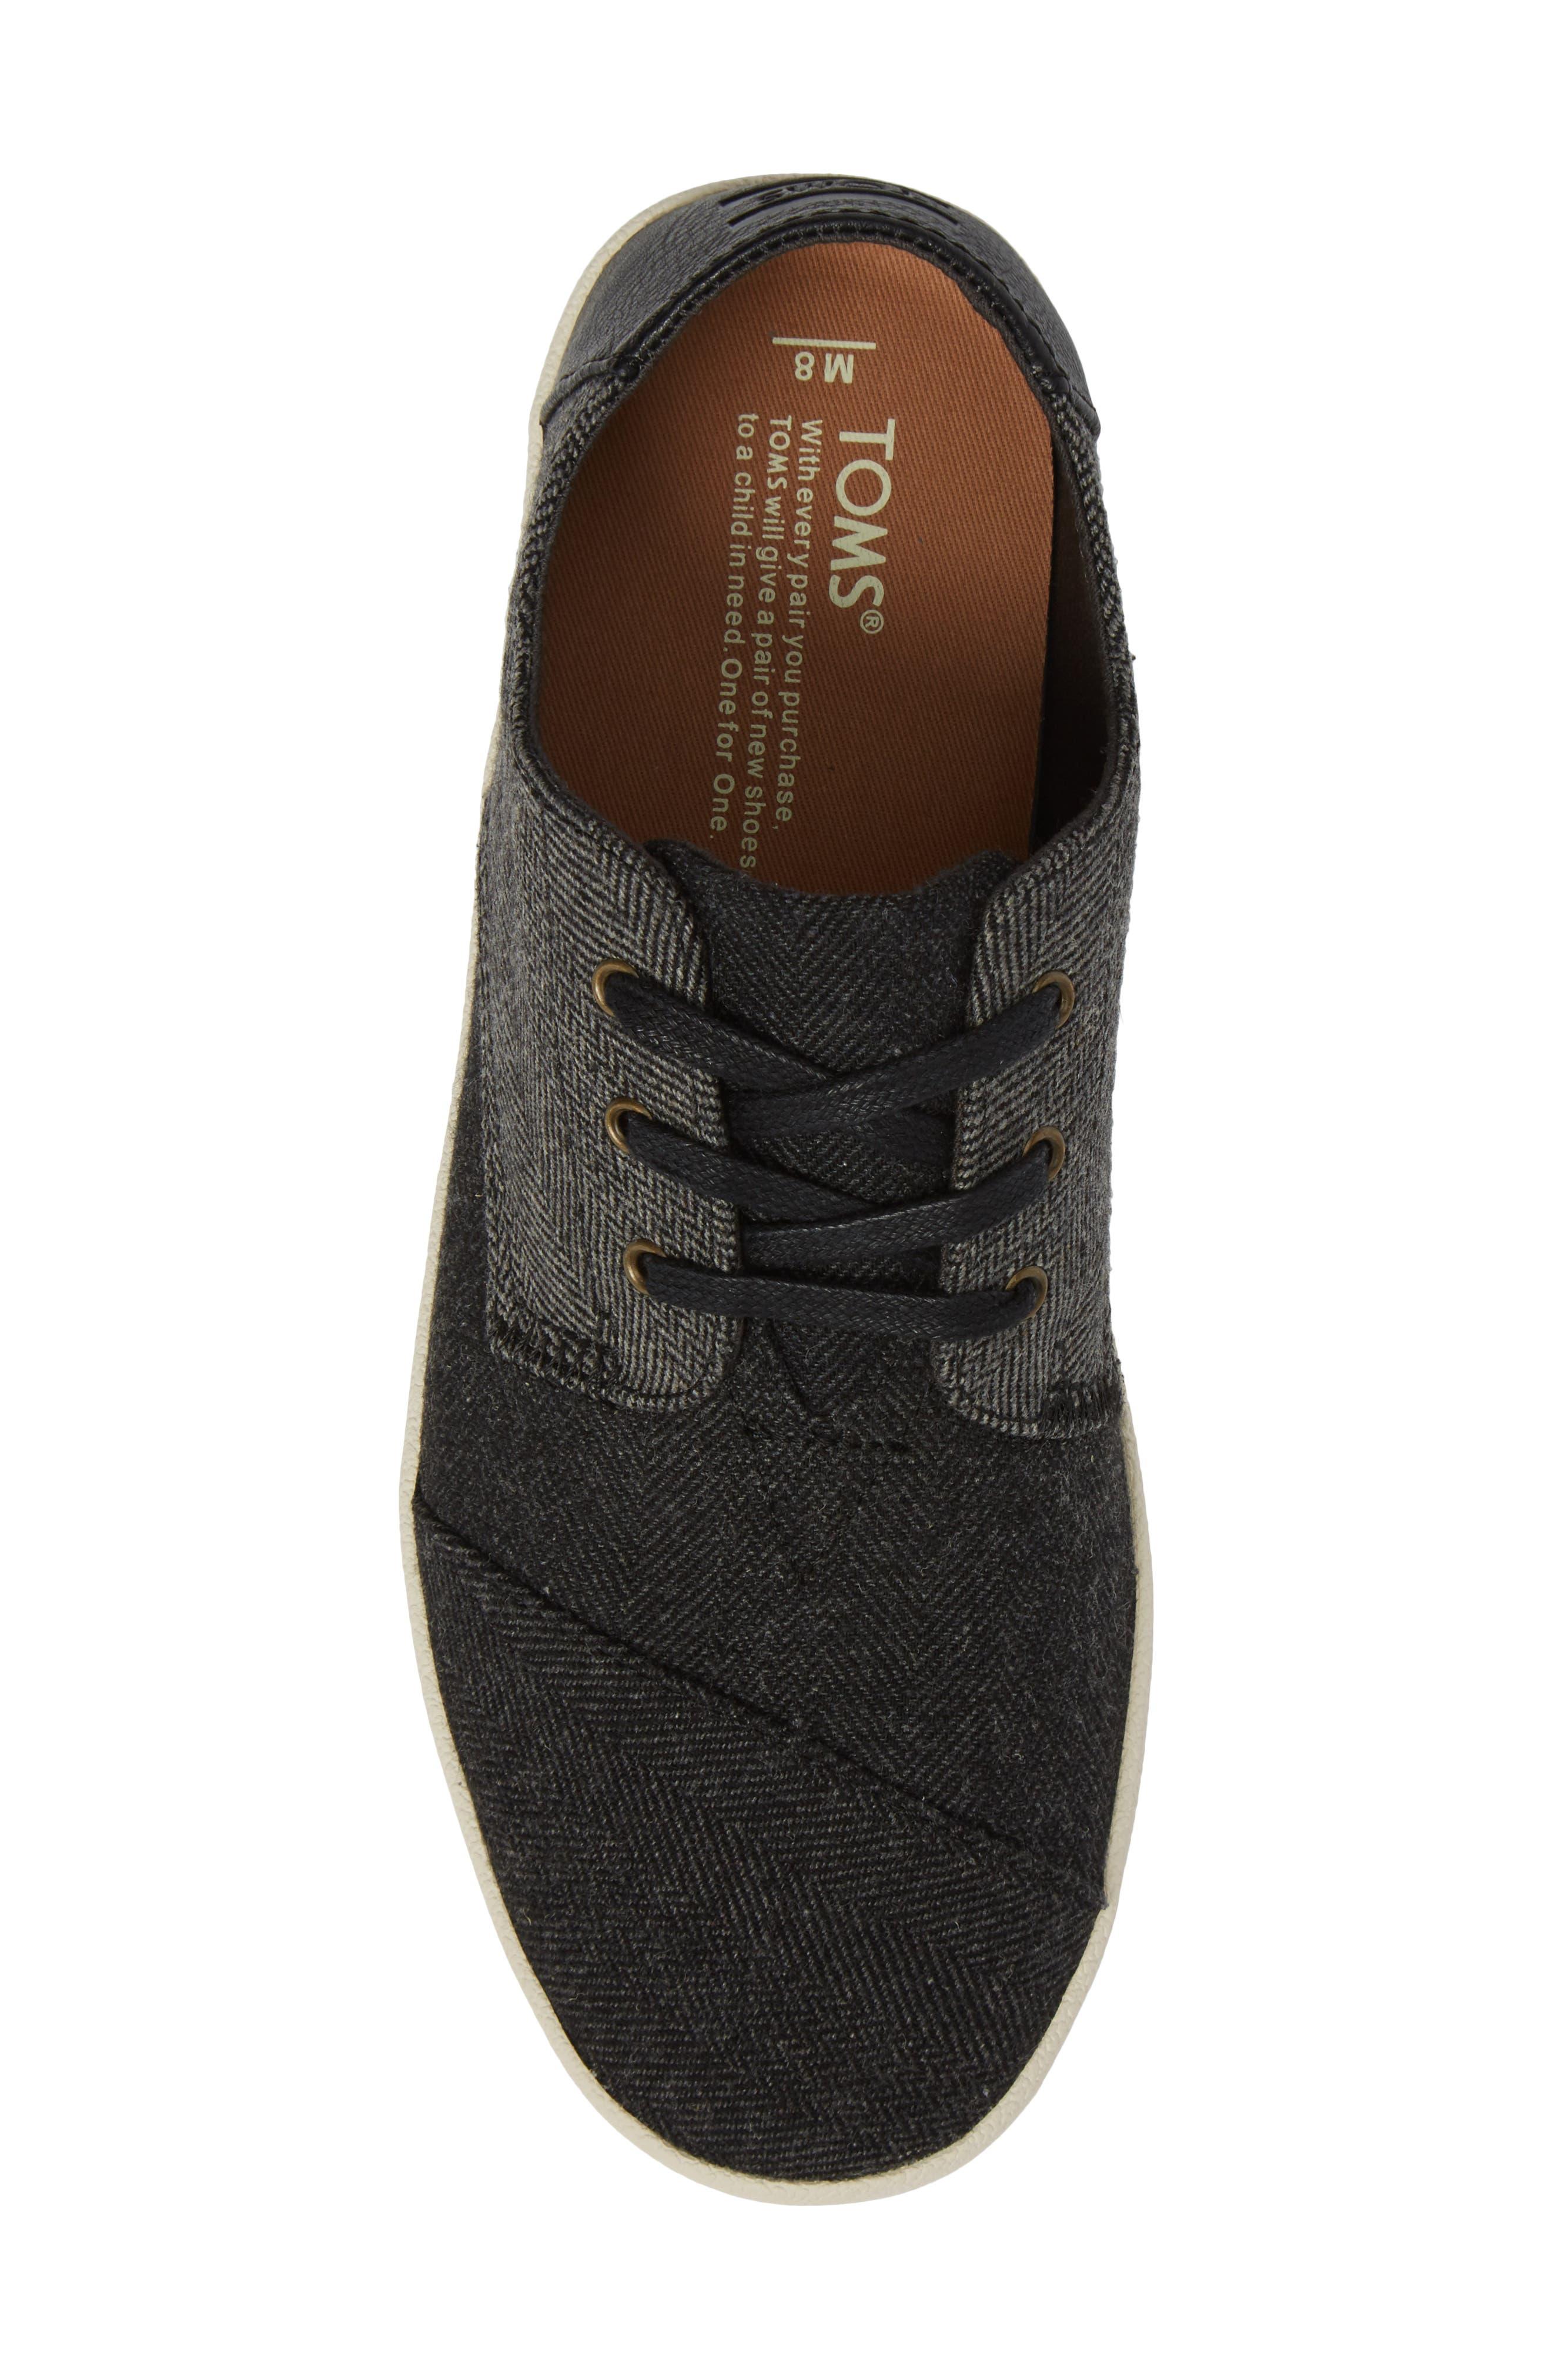 'Paseo' Sneaker,                             Alternate thumbnail 5, color,                             Black/ Grey